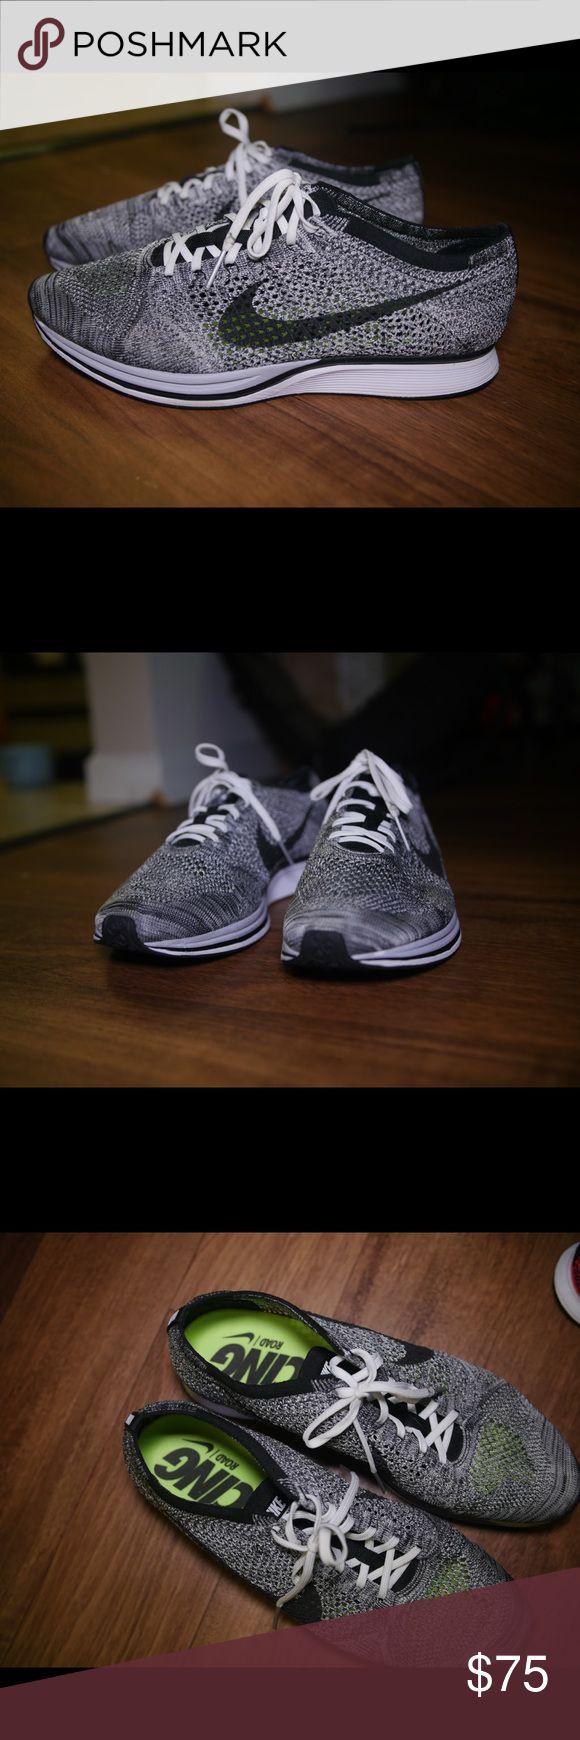 Nike Flyknit Racer Oreo Rarely used Nike Flyknit Racer Oreo. Nike Shoes Athletic Shoes